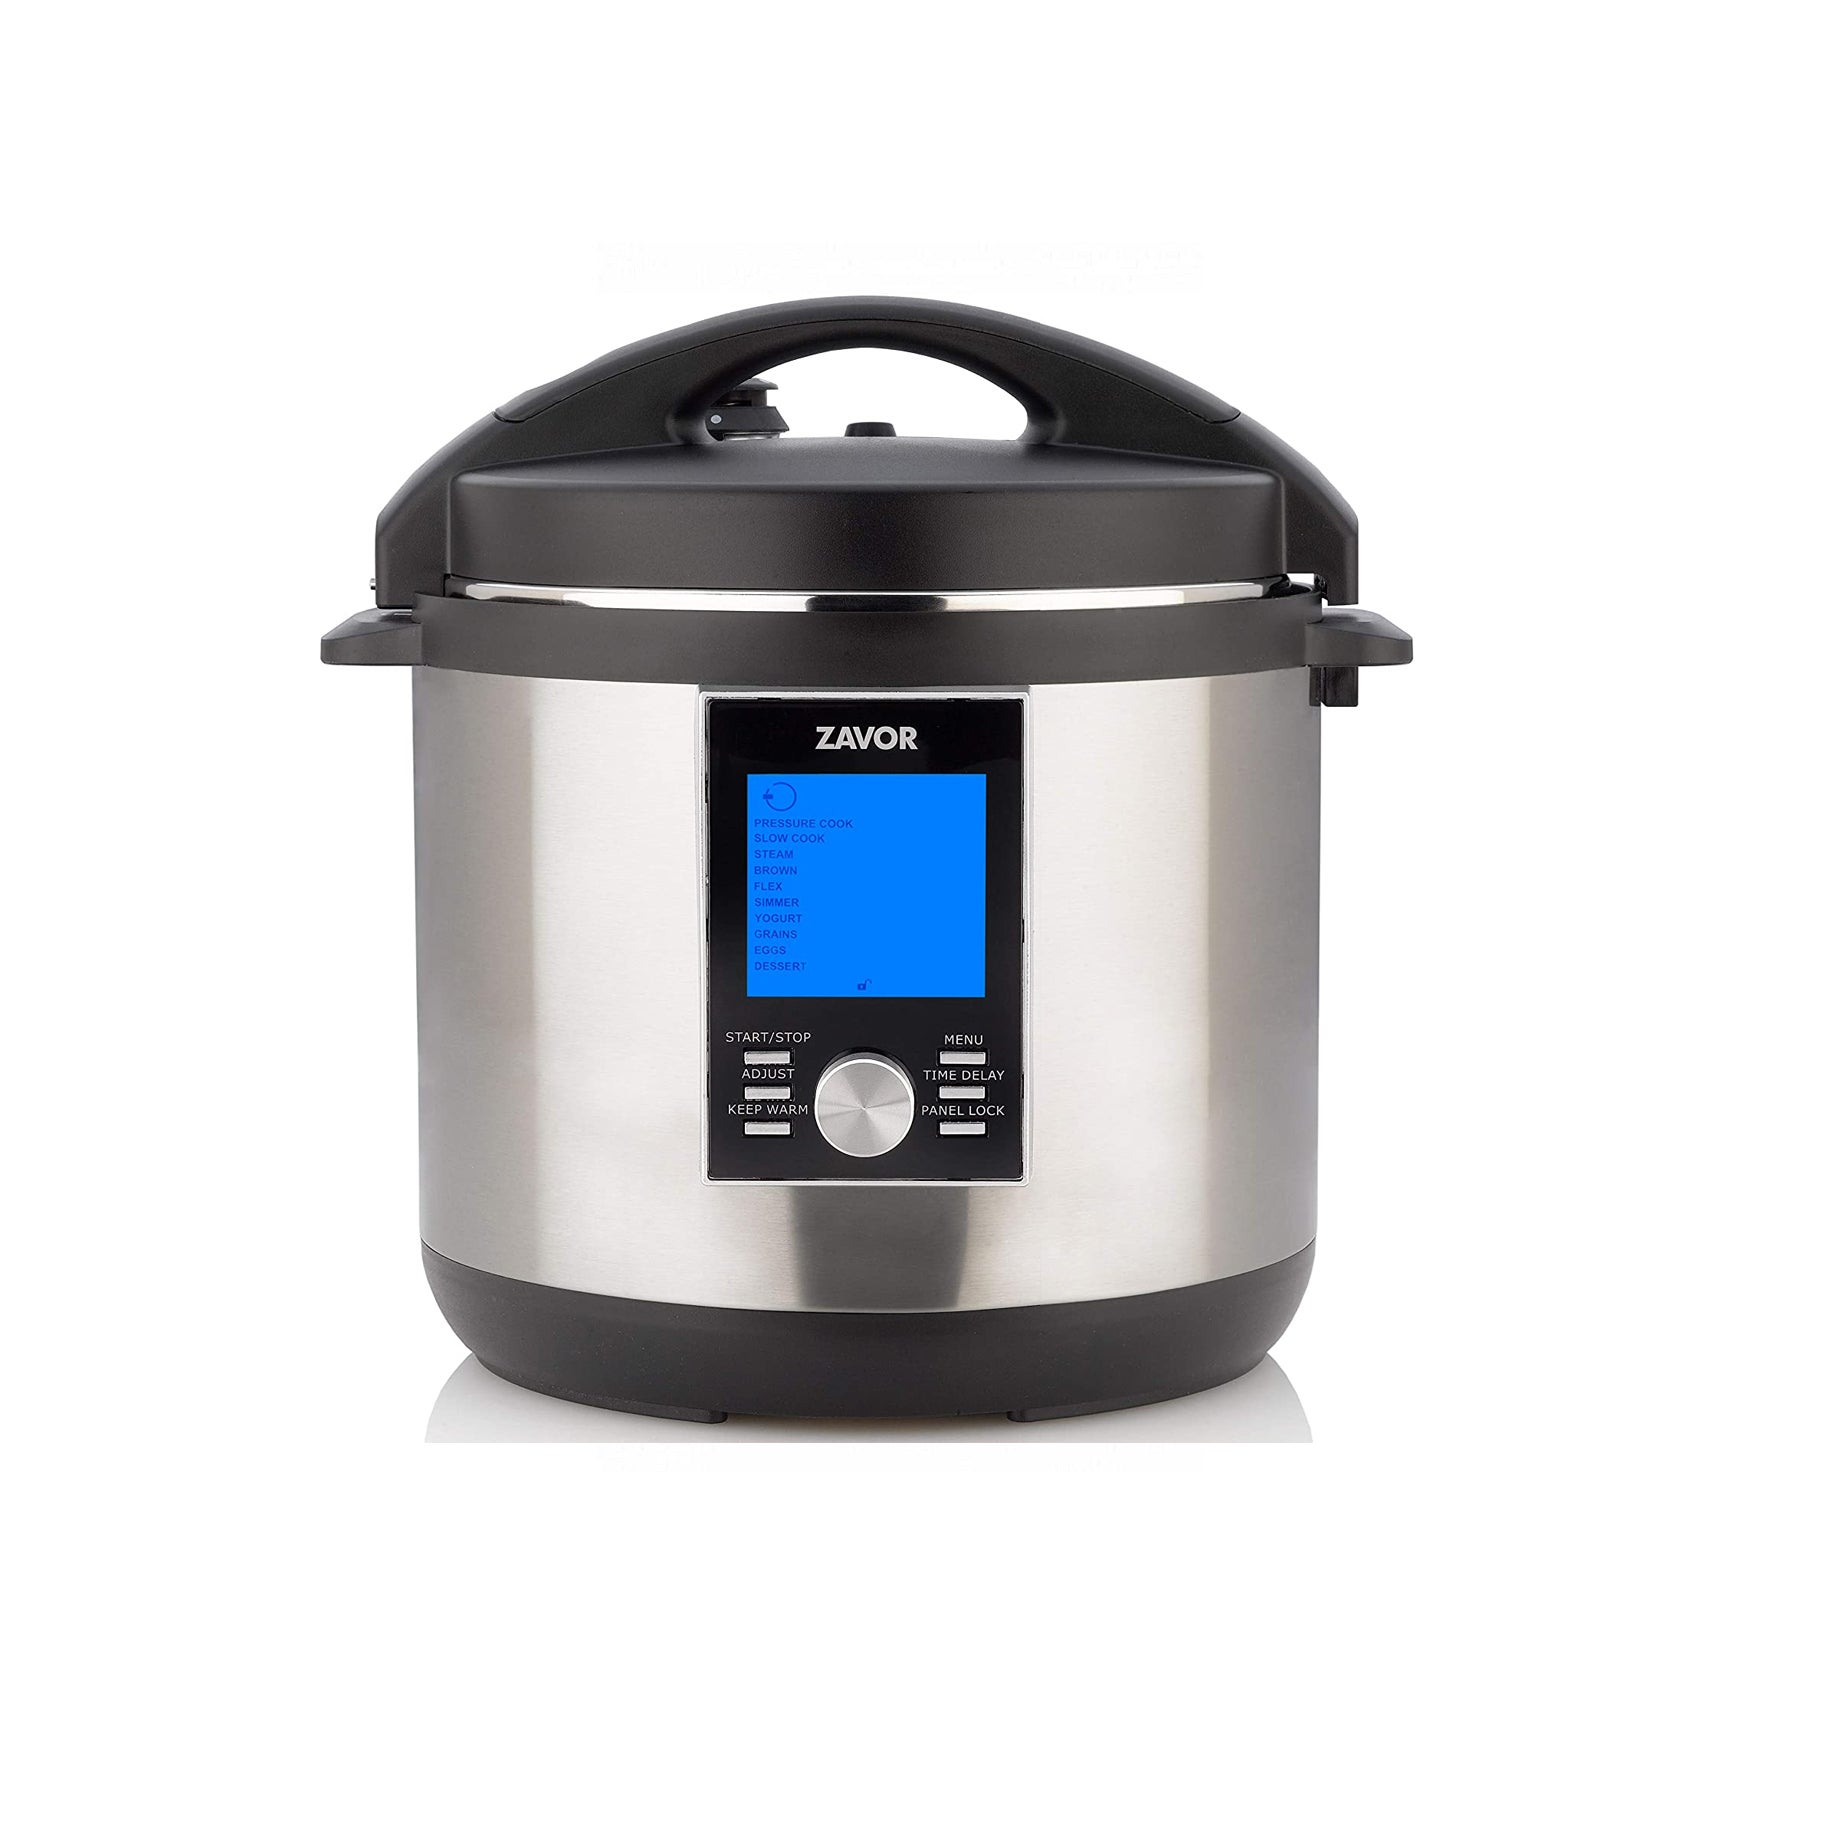 The Best Pressure Cooker Option: Zavor Lux LCD 8 Quart